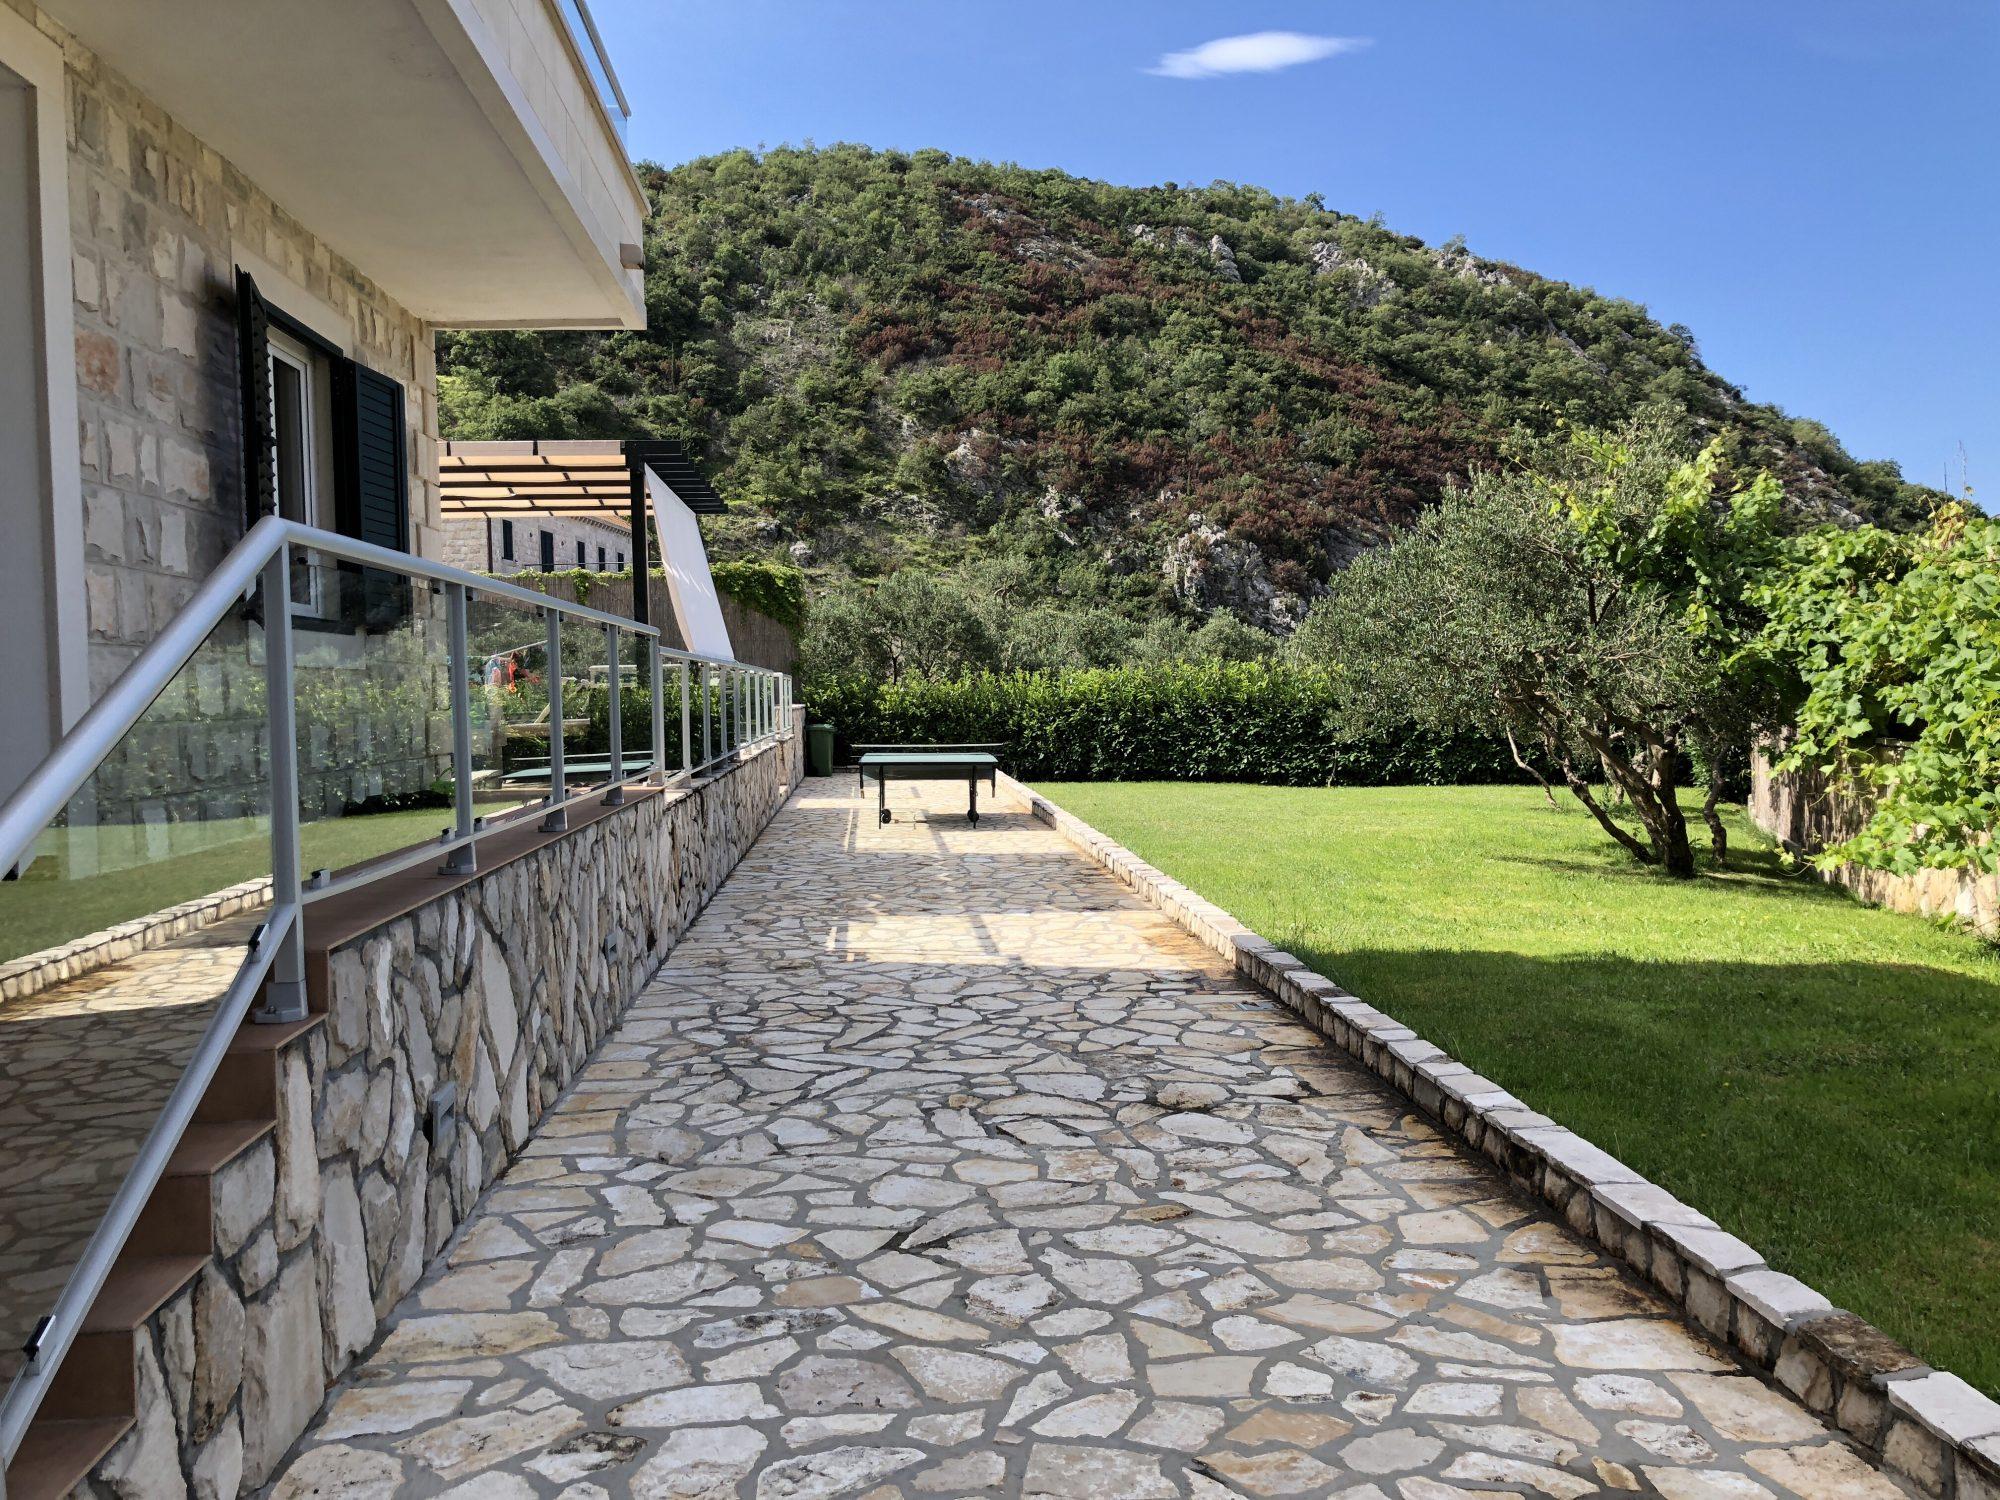 Hyra hus i bergen nära Dubrovnik